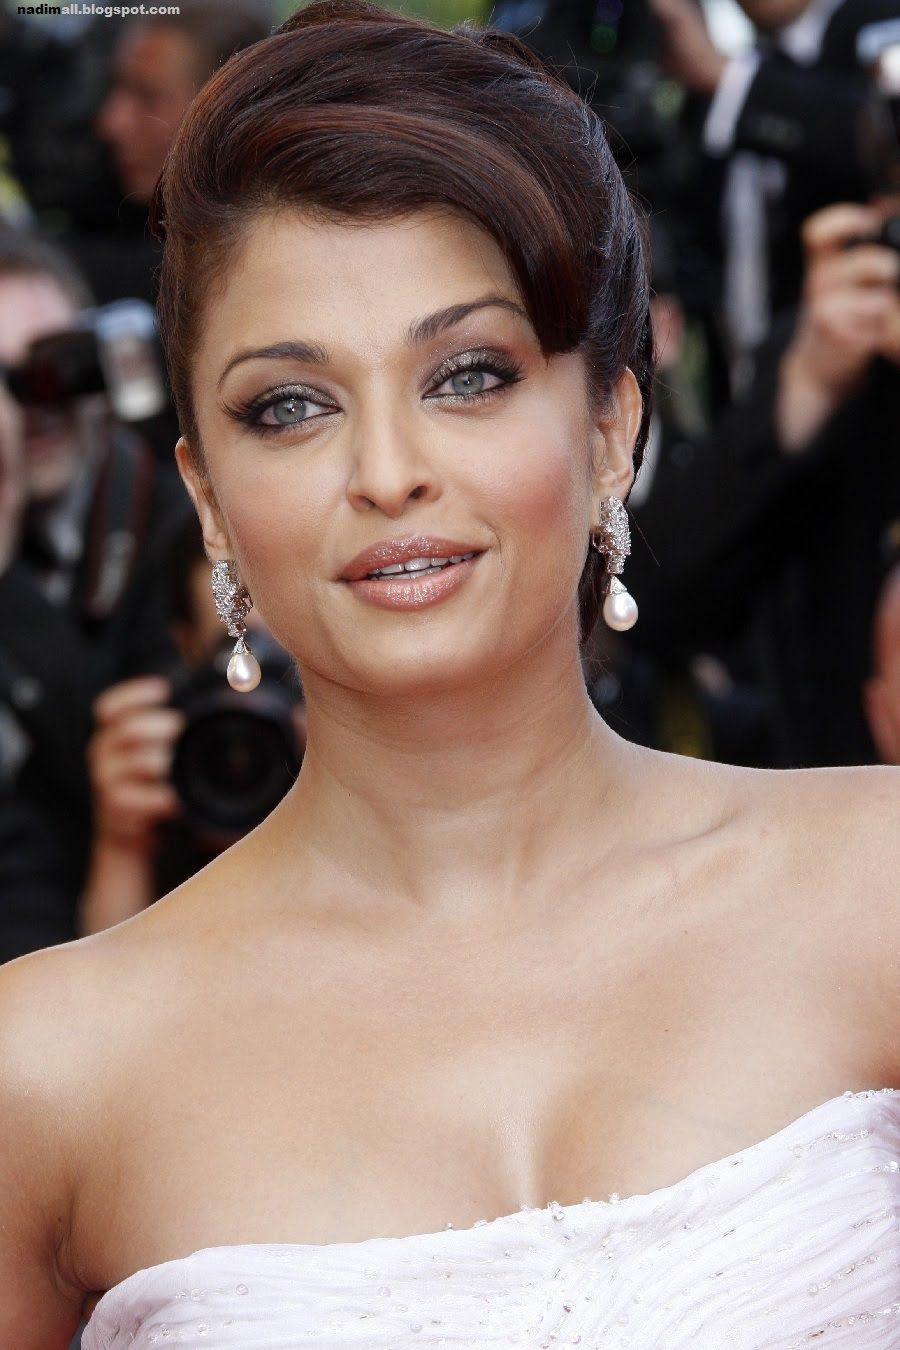 62nd cannes 2009   actress aishwarya rai, aishwarya rai